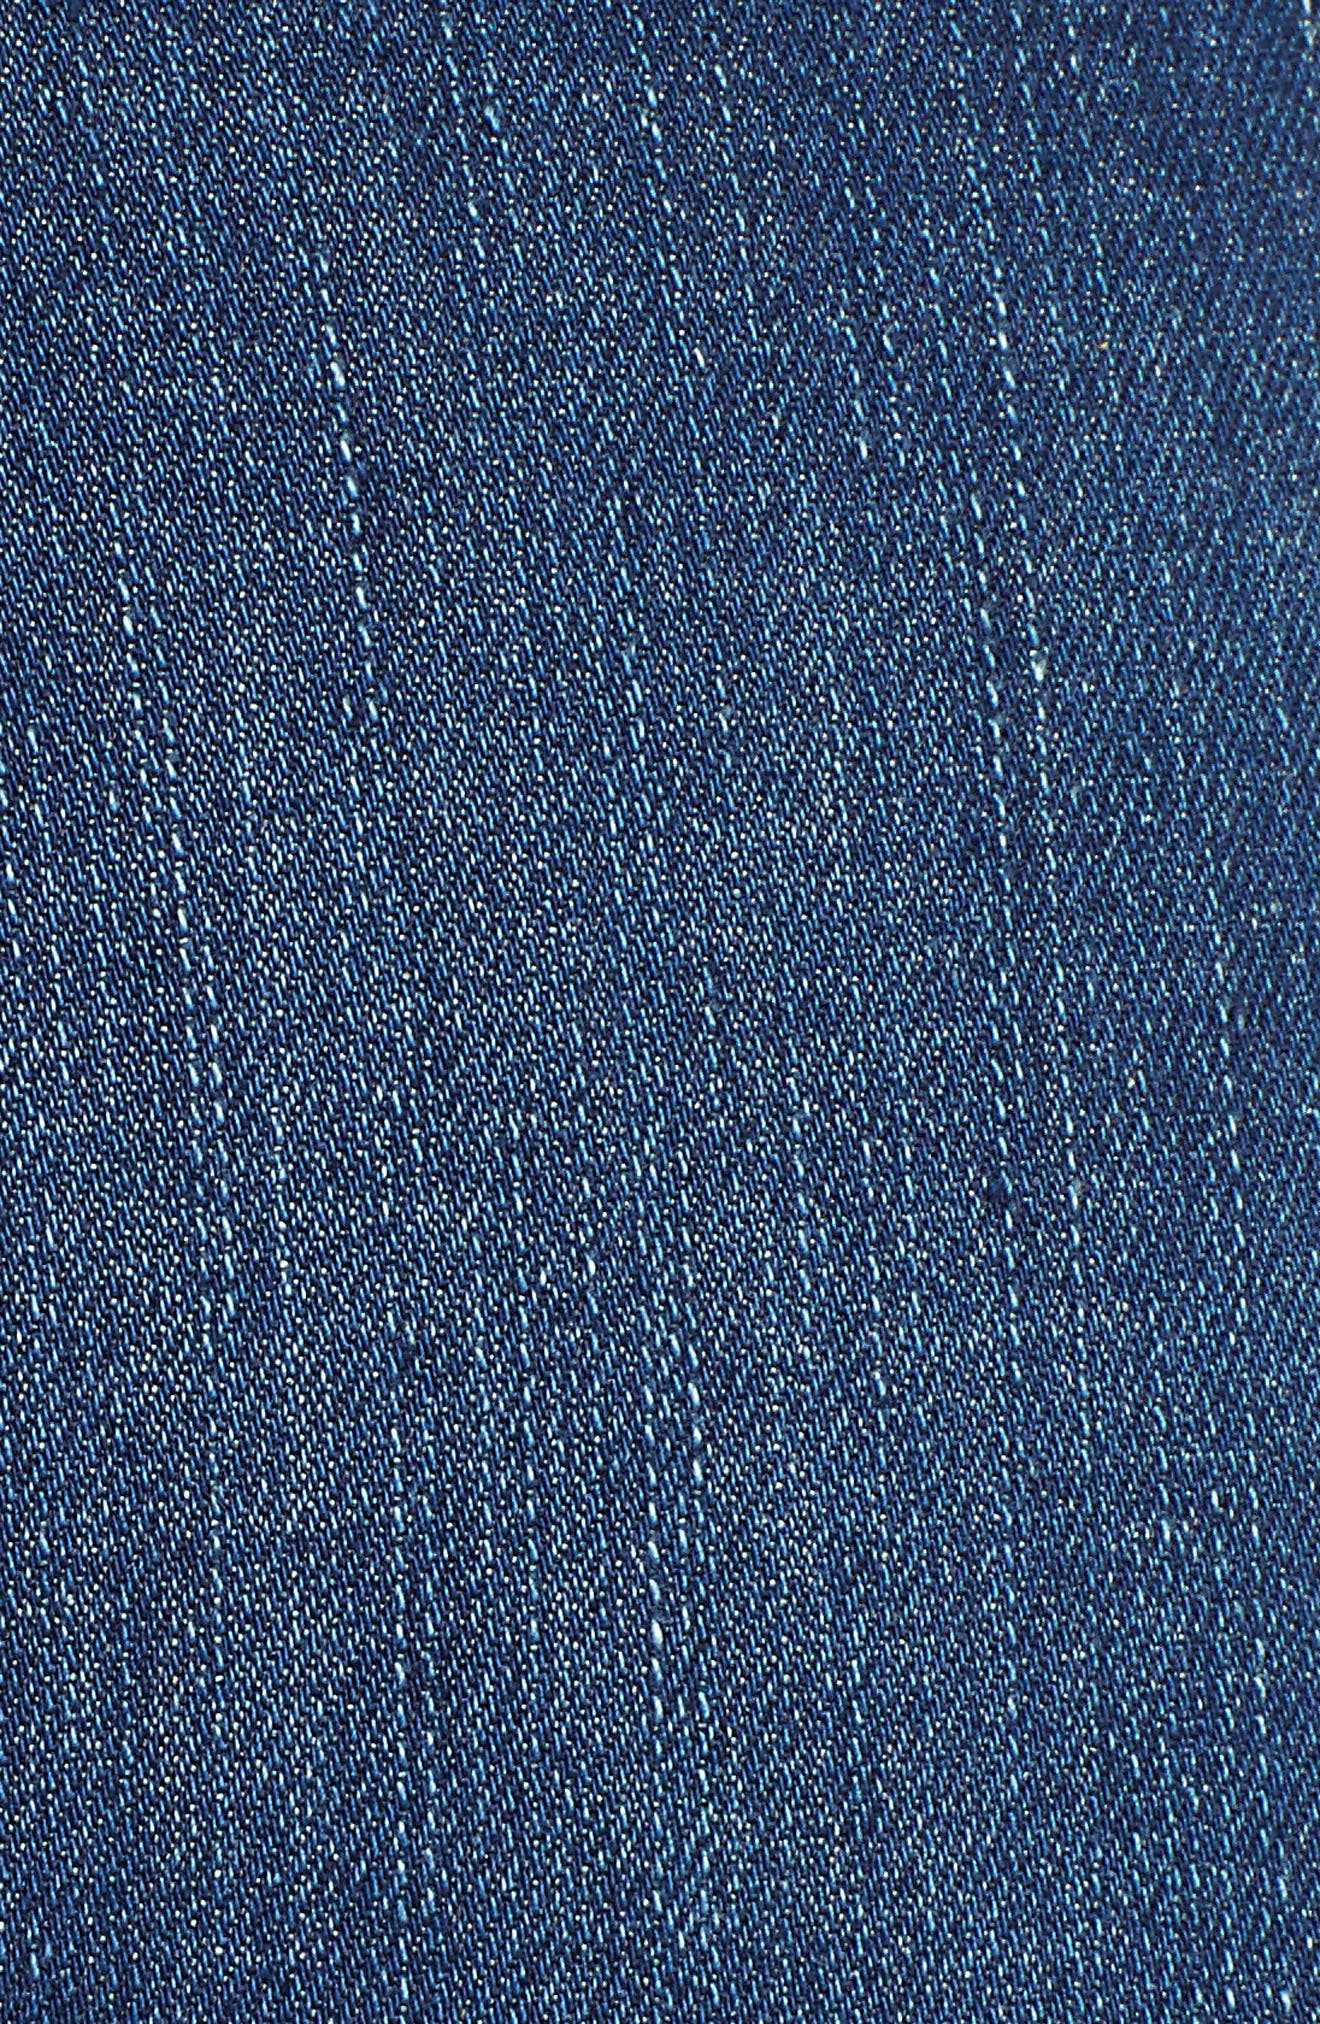 MADEWELL,                             9-Inch Skinny Jeans Raw Hem Edition,                             Alternate thumbnail 6, color,                             PALOMA